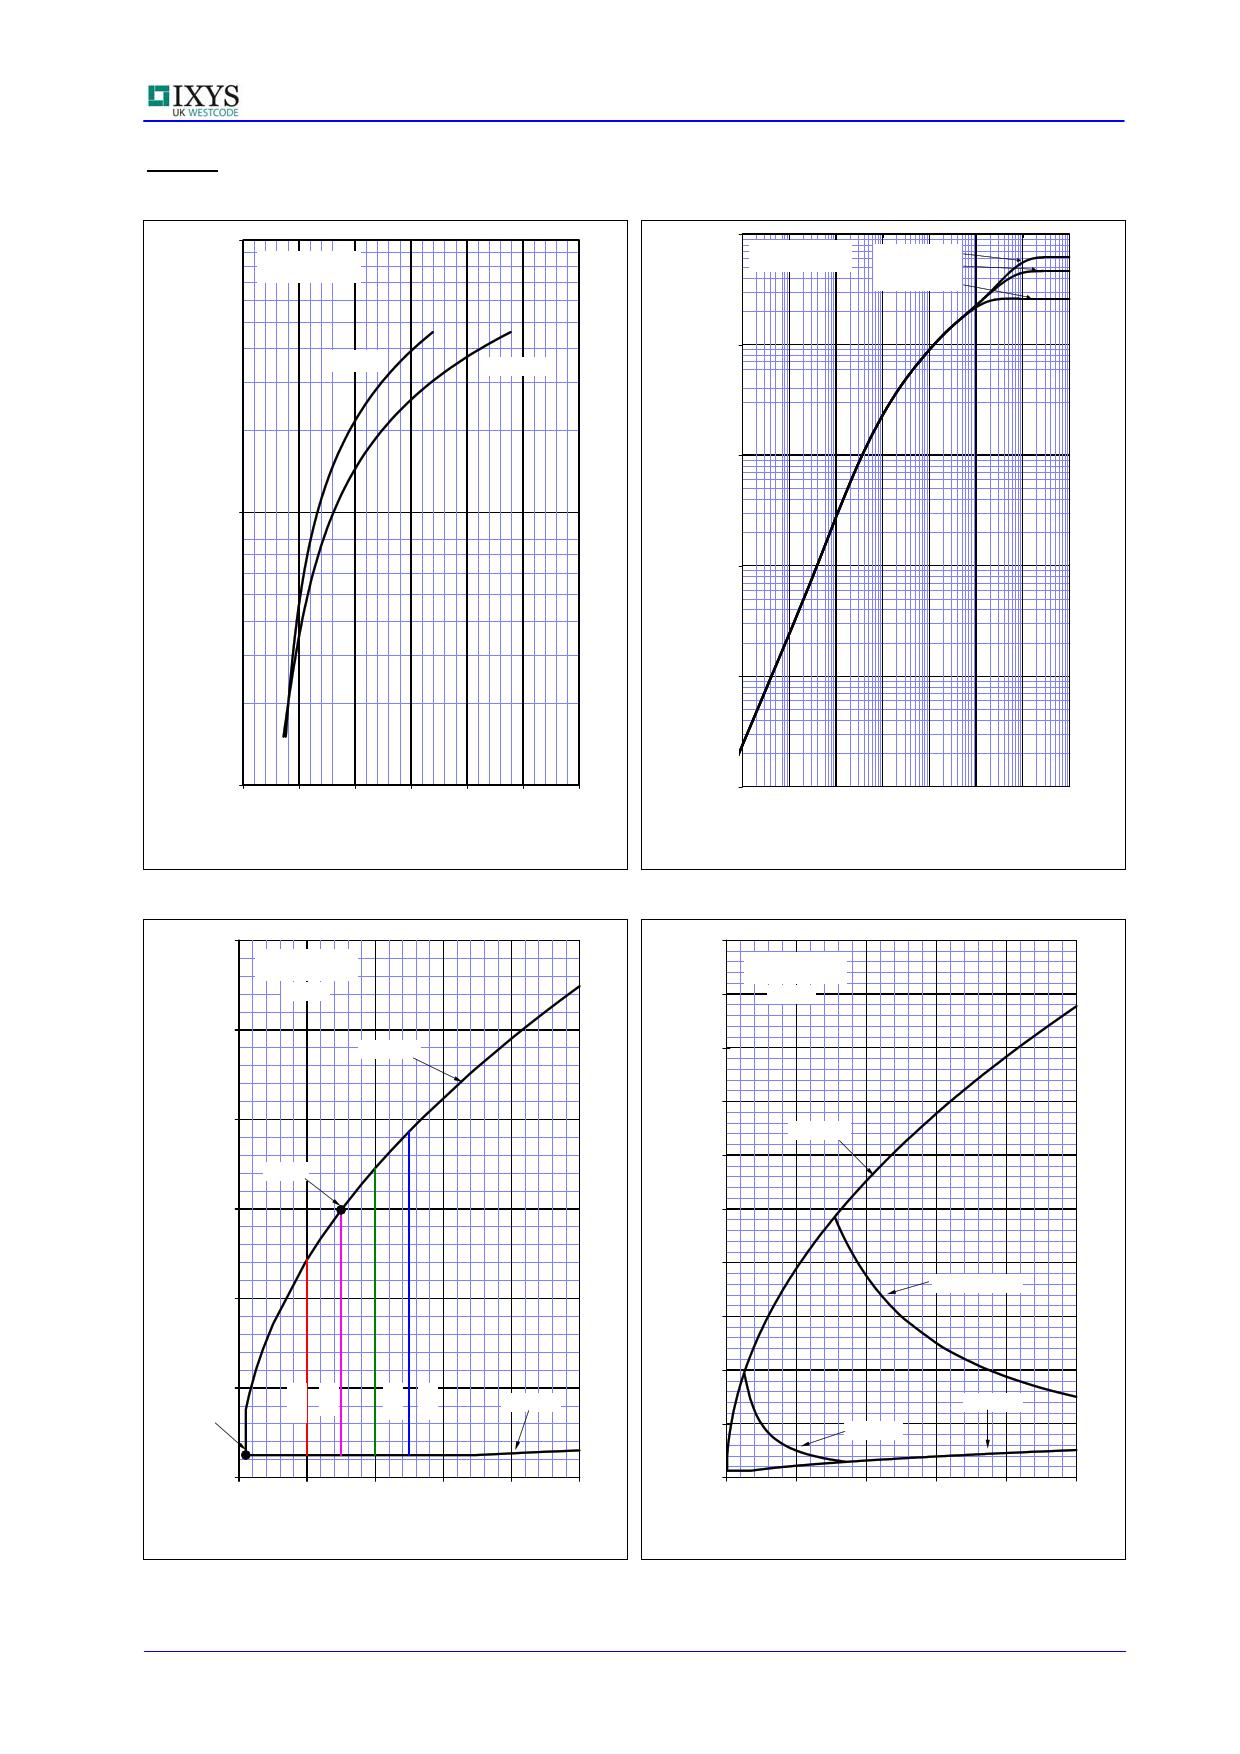 K0625QA650 pdf